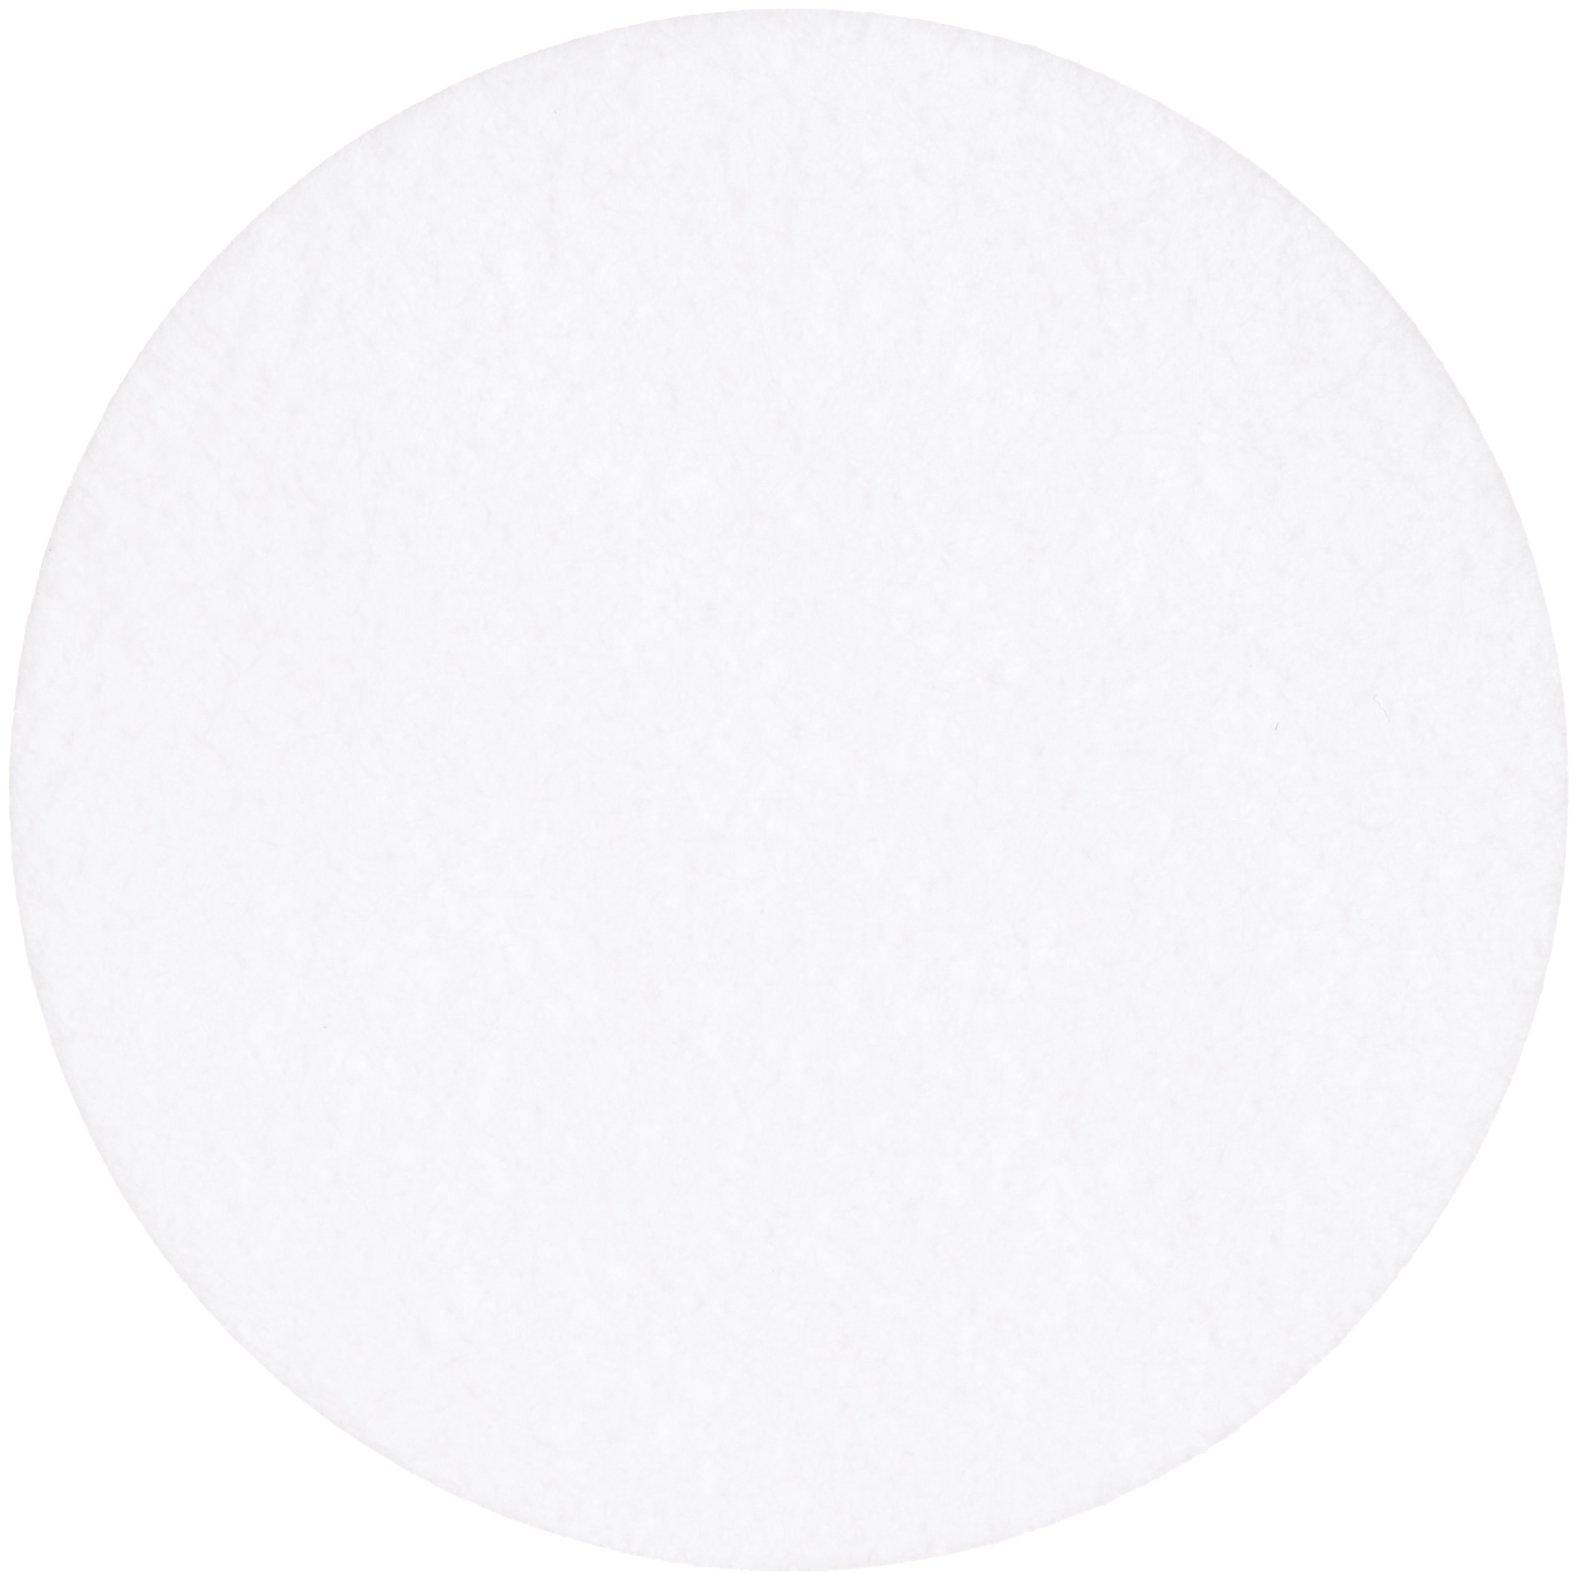 Sundstrom H02-0121 SR 221 Prefilter (Box of 80)